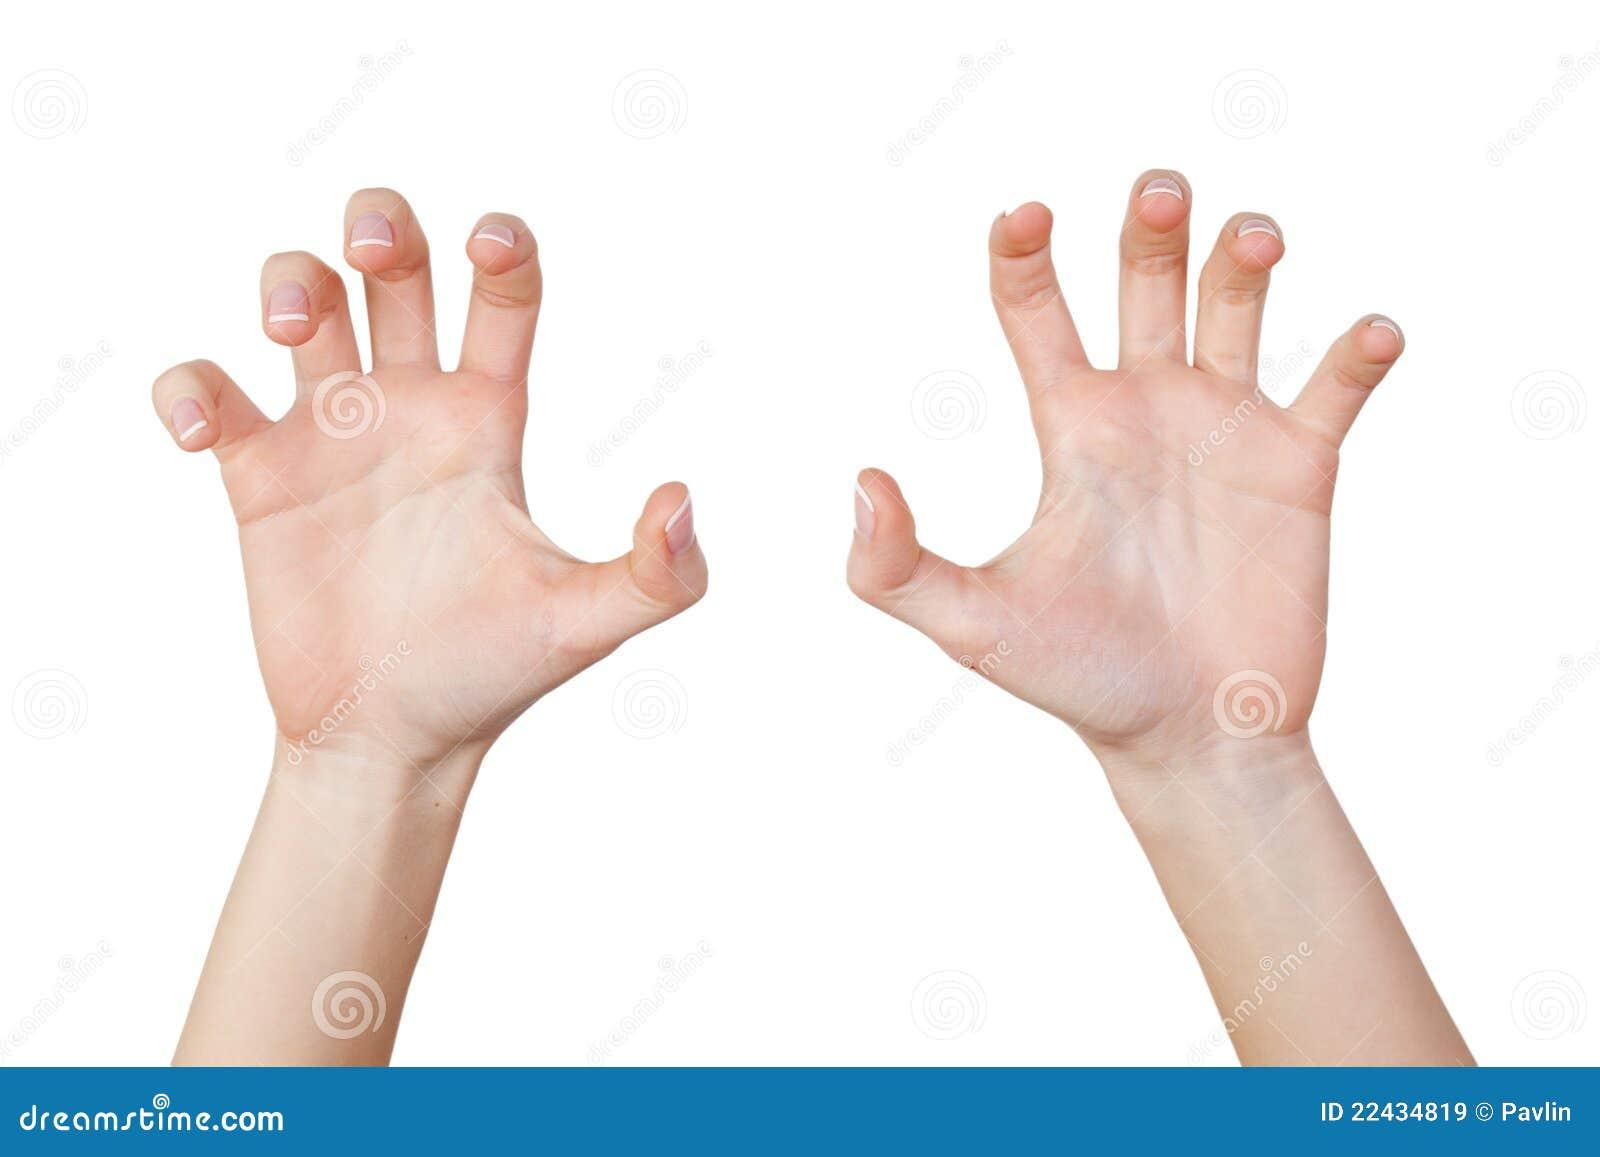 Scary Dementor Child Hands - Kids Harry Potter Dementor Costume Gloves